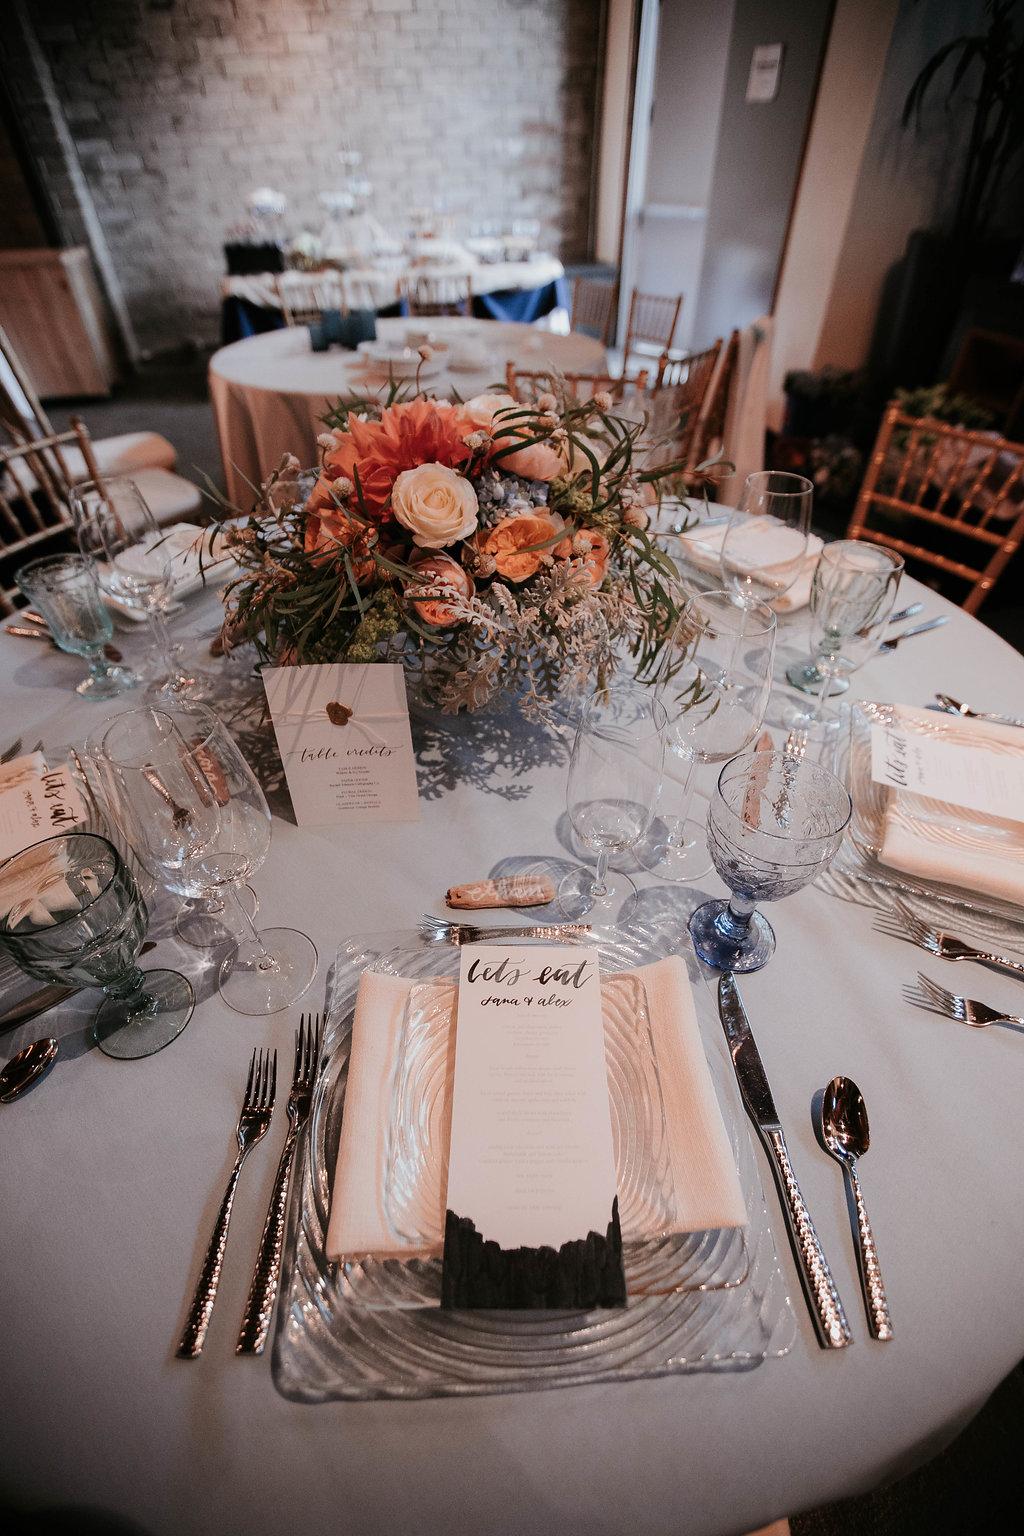 The_Big_Fake_wedding_Seattle_Within_sodo_wedding_by_Adina_Preston_Weddings_277.JPG